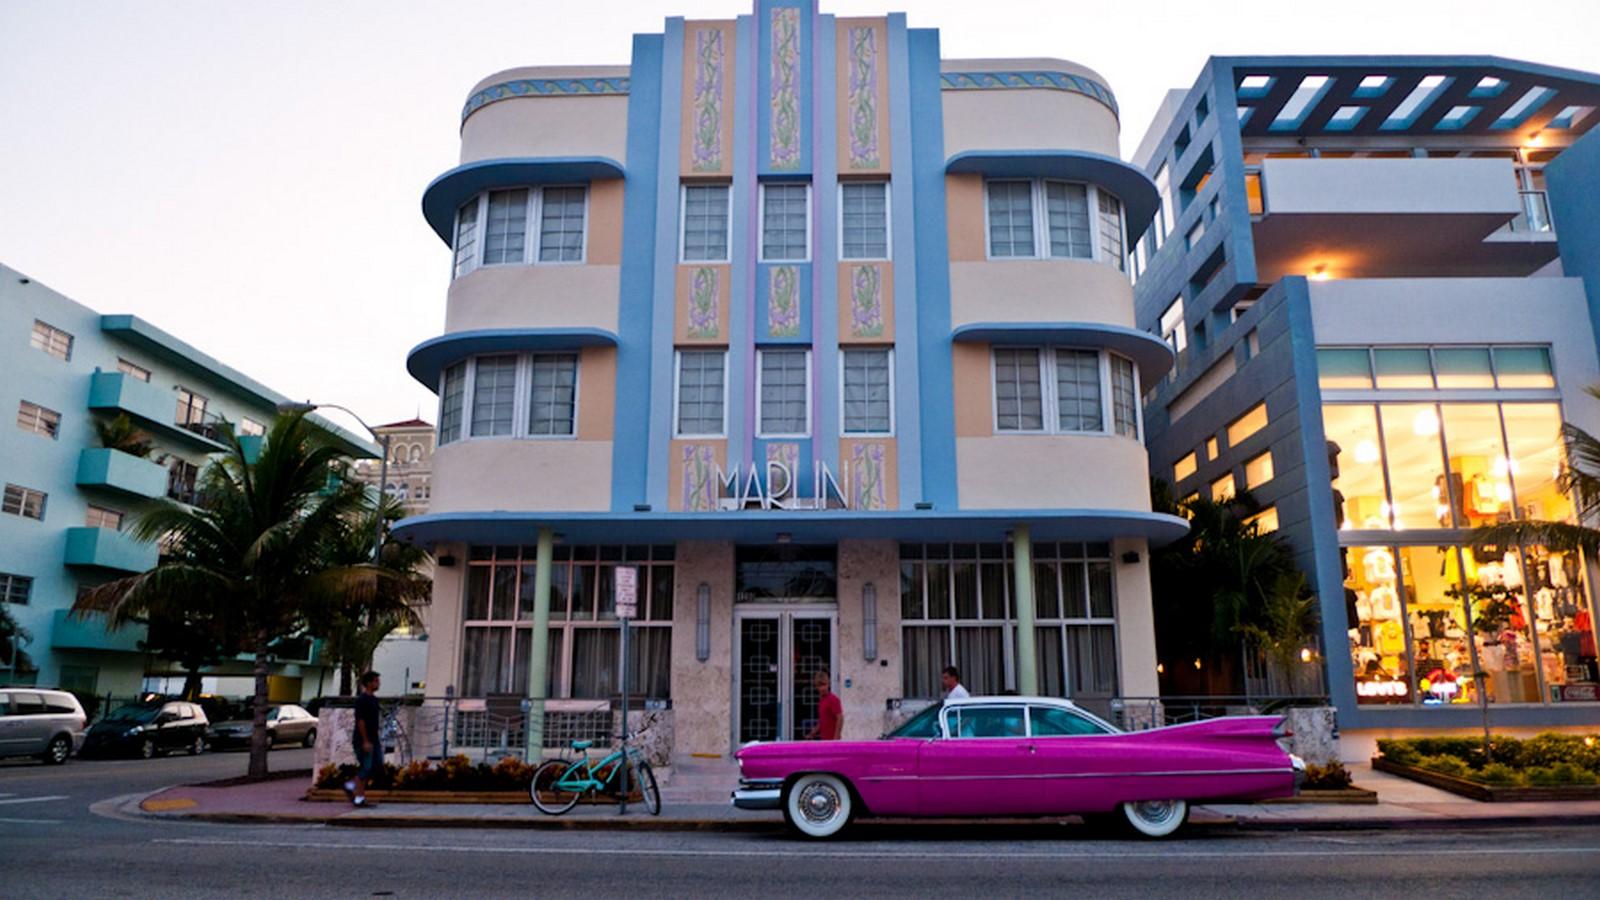 The Marlin Hotel - Miami Beach, Florida - Sheet1